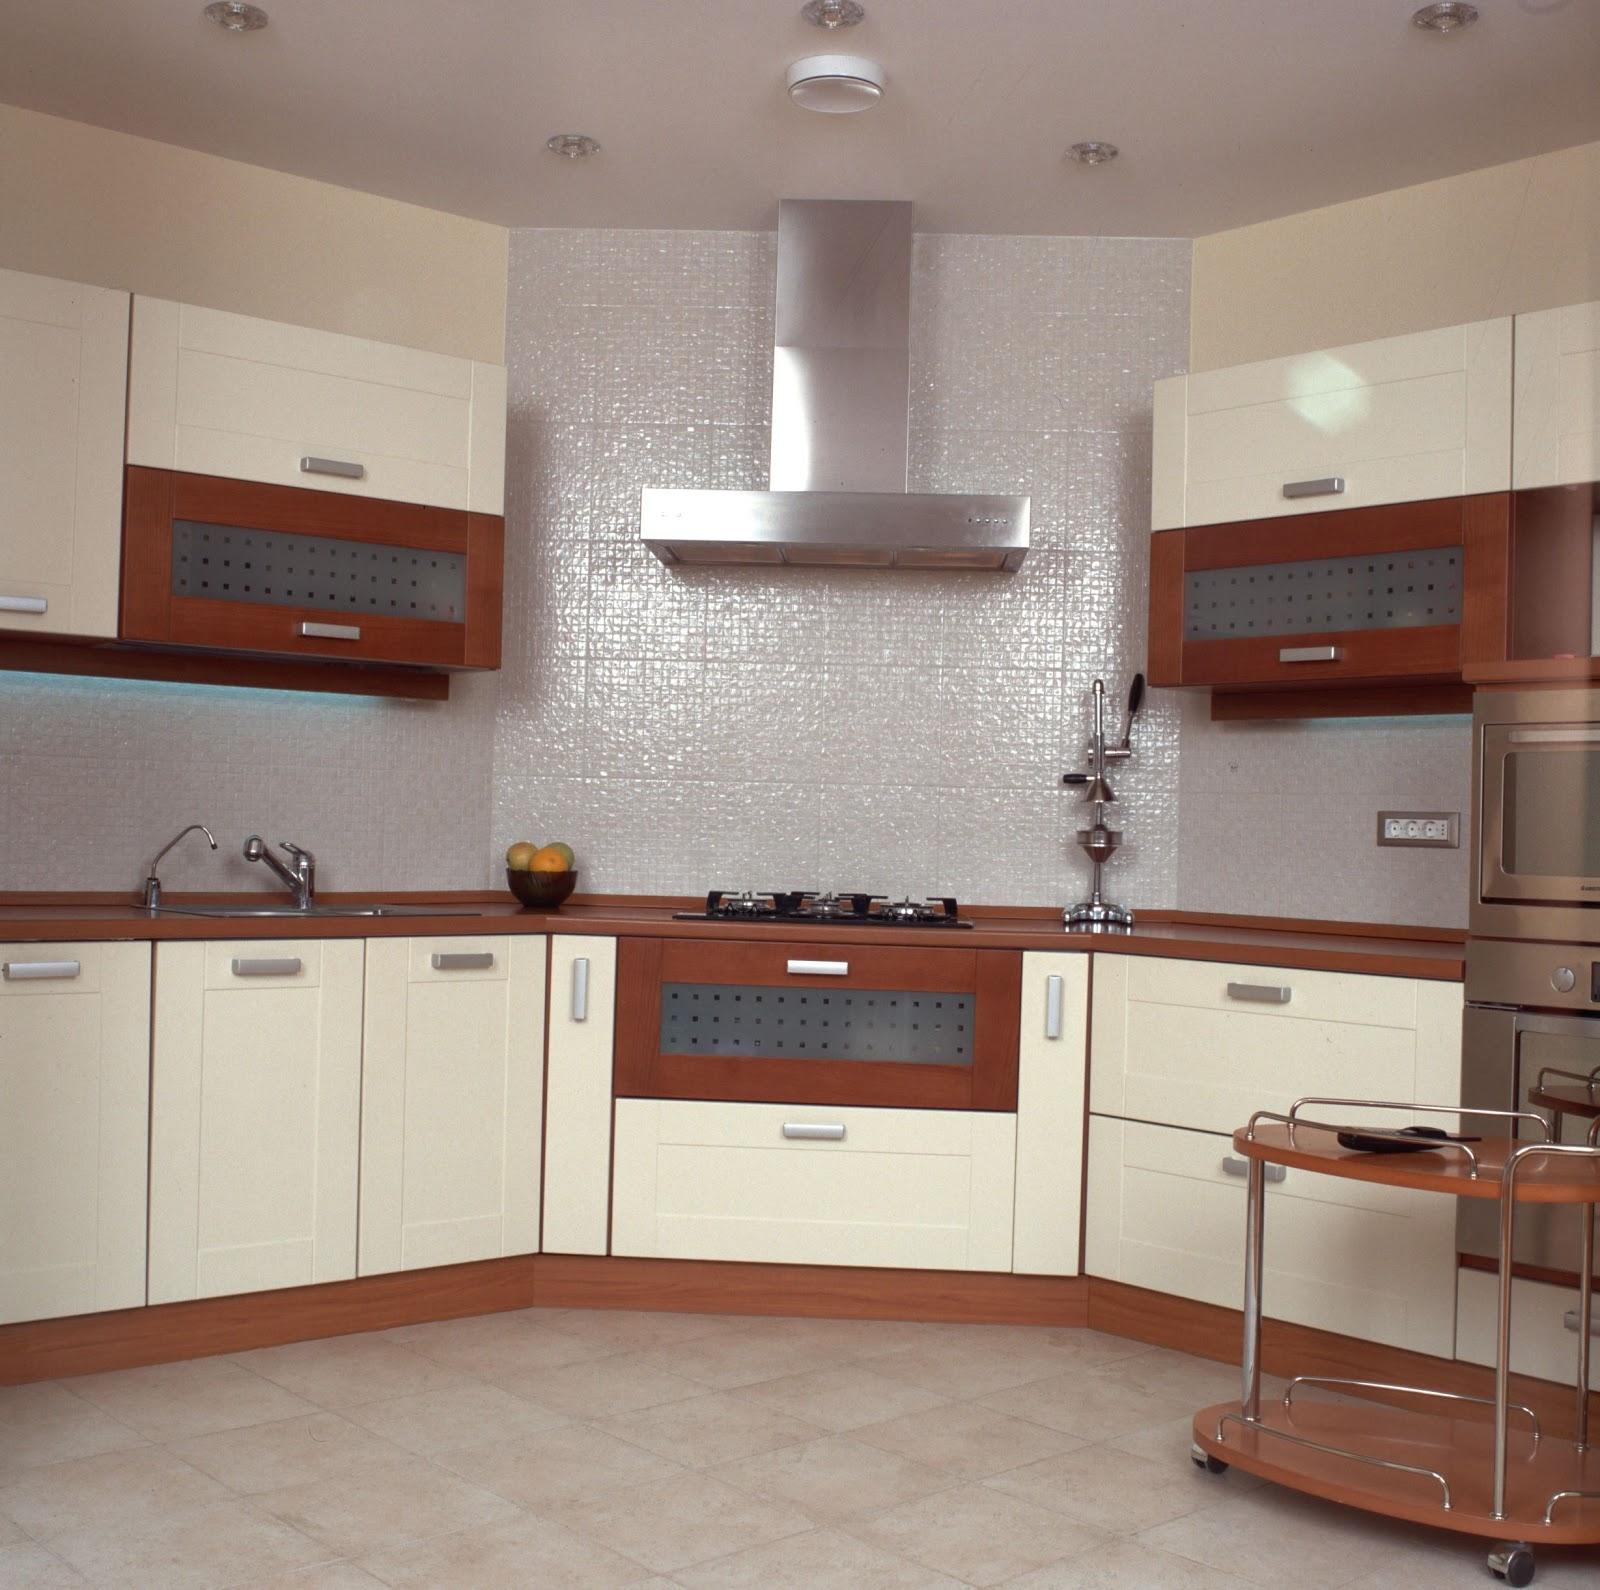 Penggunaan Warna Putih Gambar Di Bawah Untuk Kabinet Dapur Nampak Bersih Tetapi Mungkin R Dijaga Atau Pelihara Kebersihannya